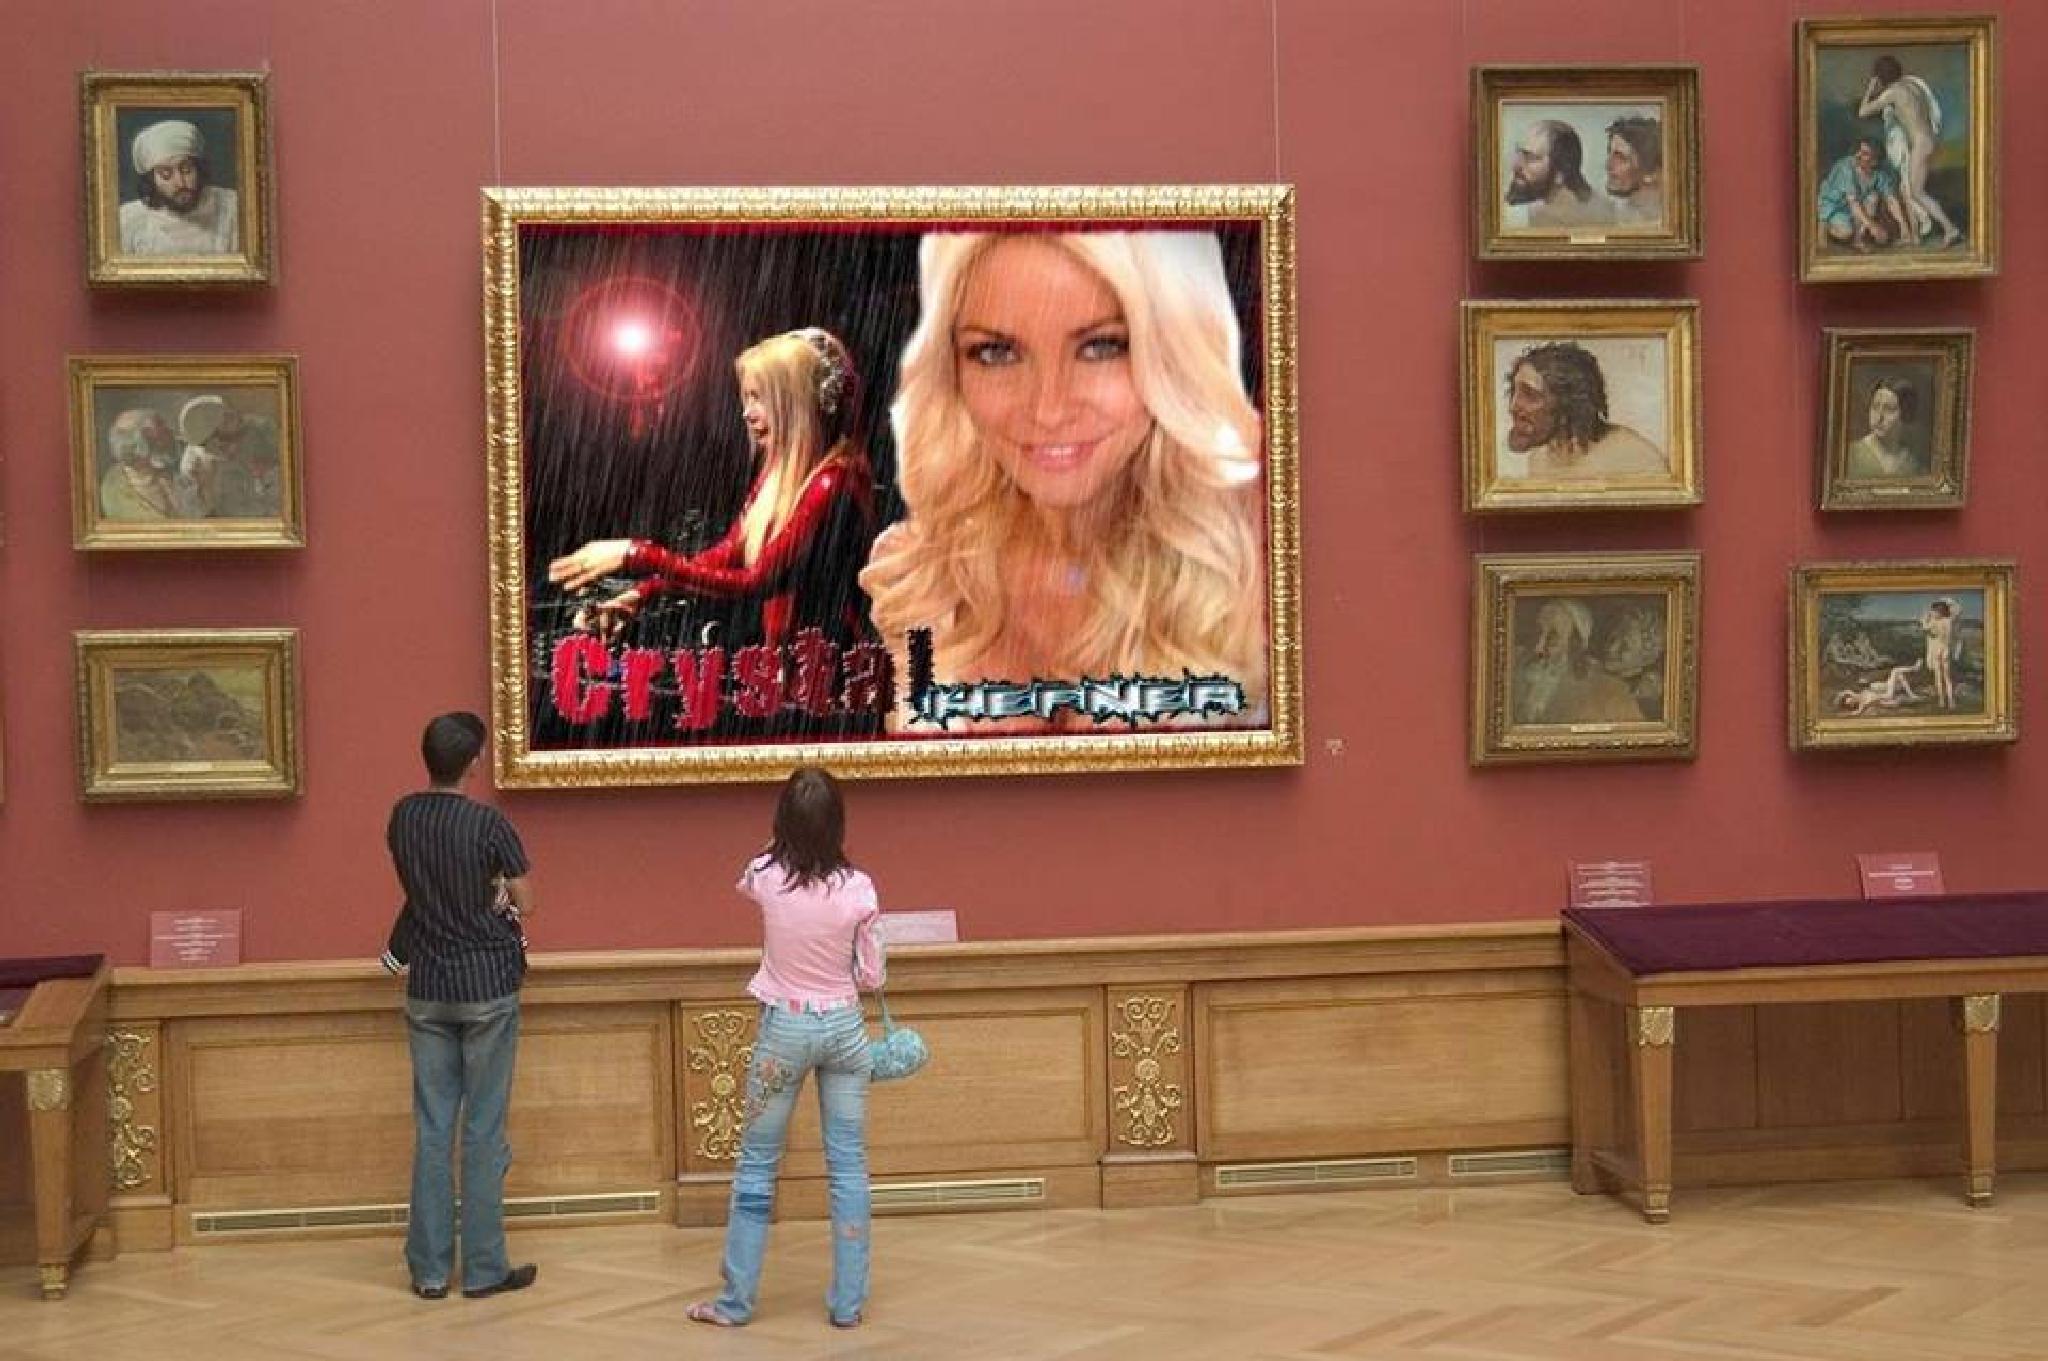 Crystal (Mrs Playboy) Hefner by Benjamin Sanchez